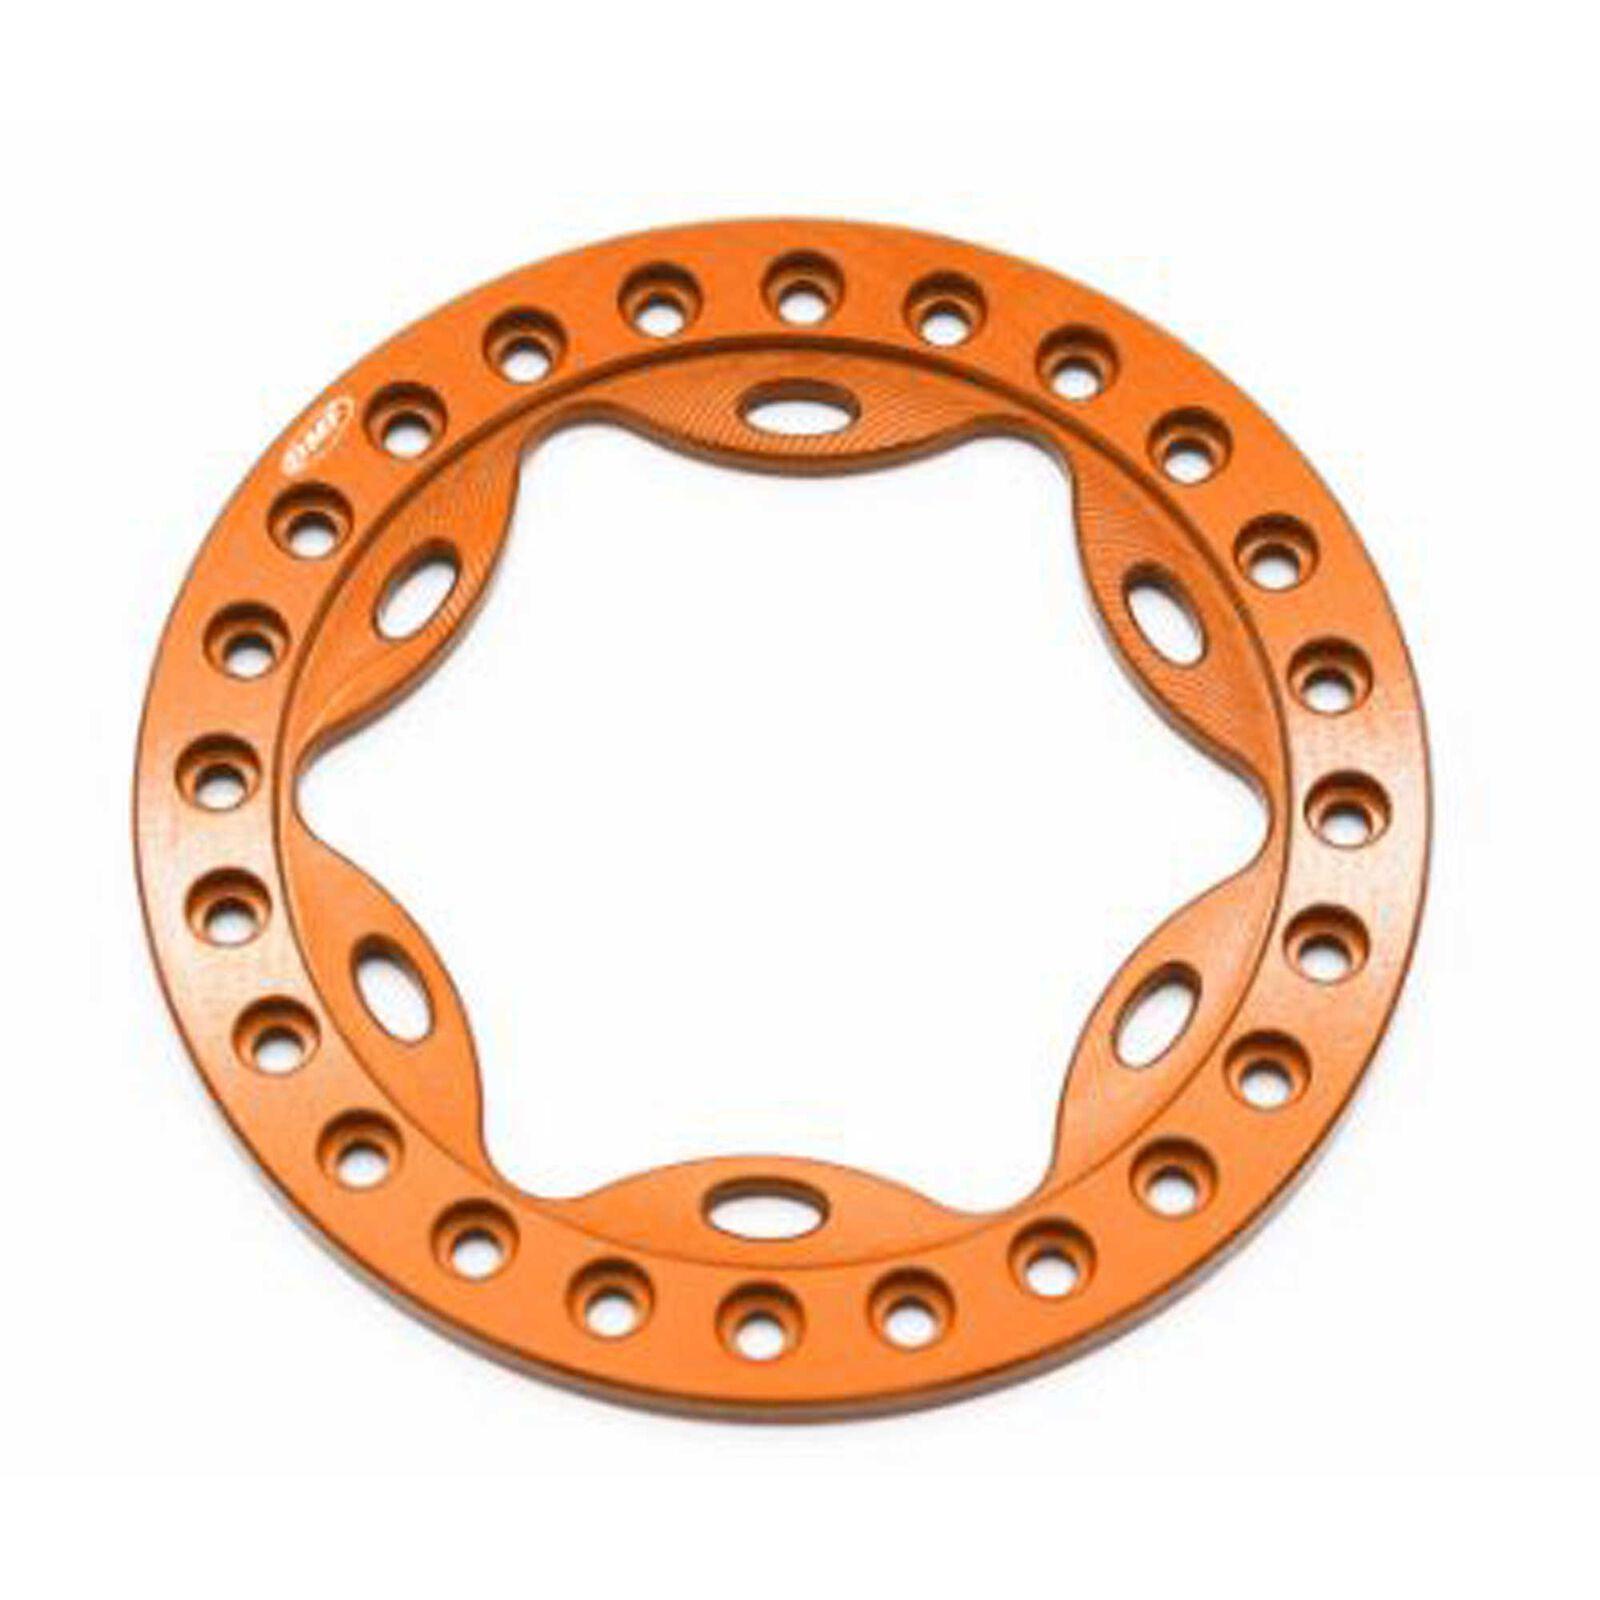 OMF 1.9 Scallop Beadlock Orange Anodized